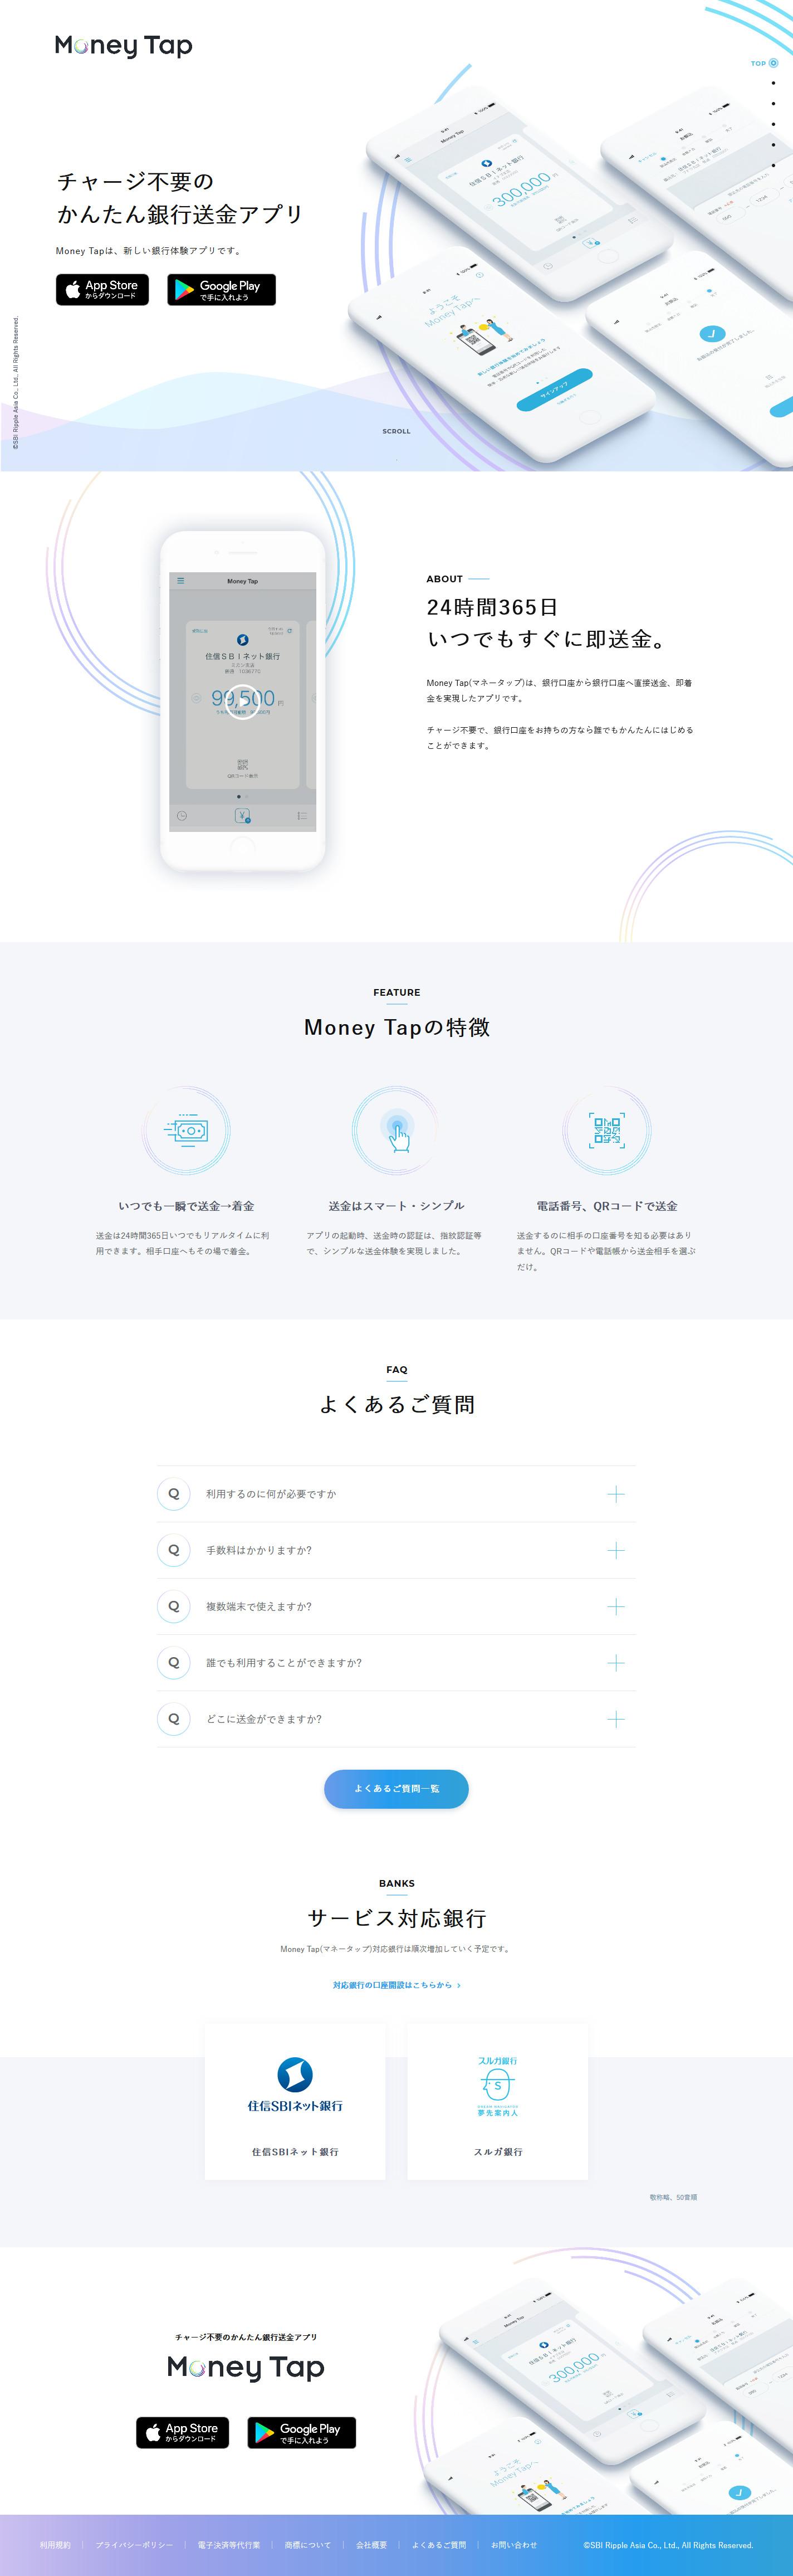 Money Tap (マネータップ)